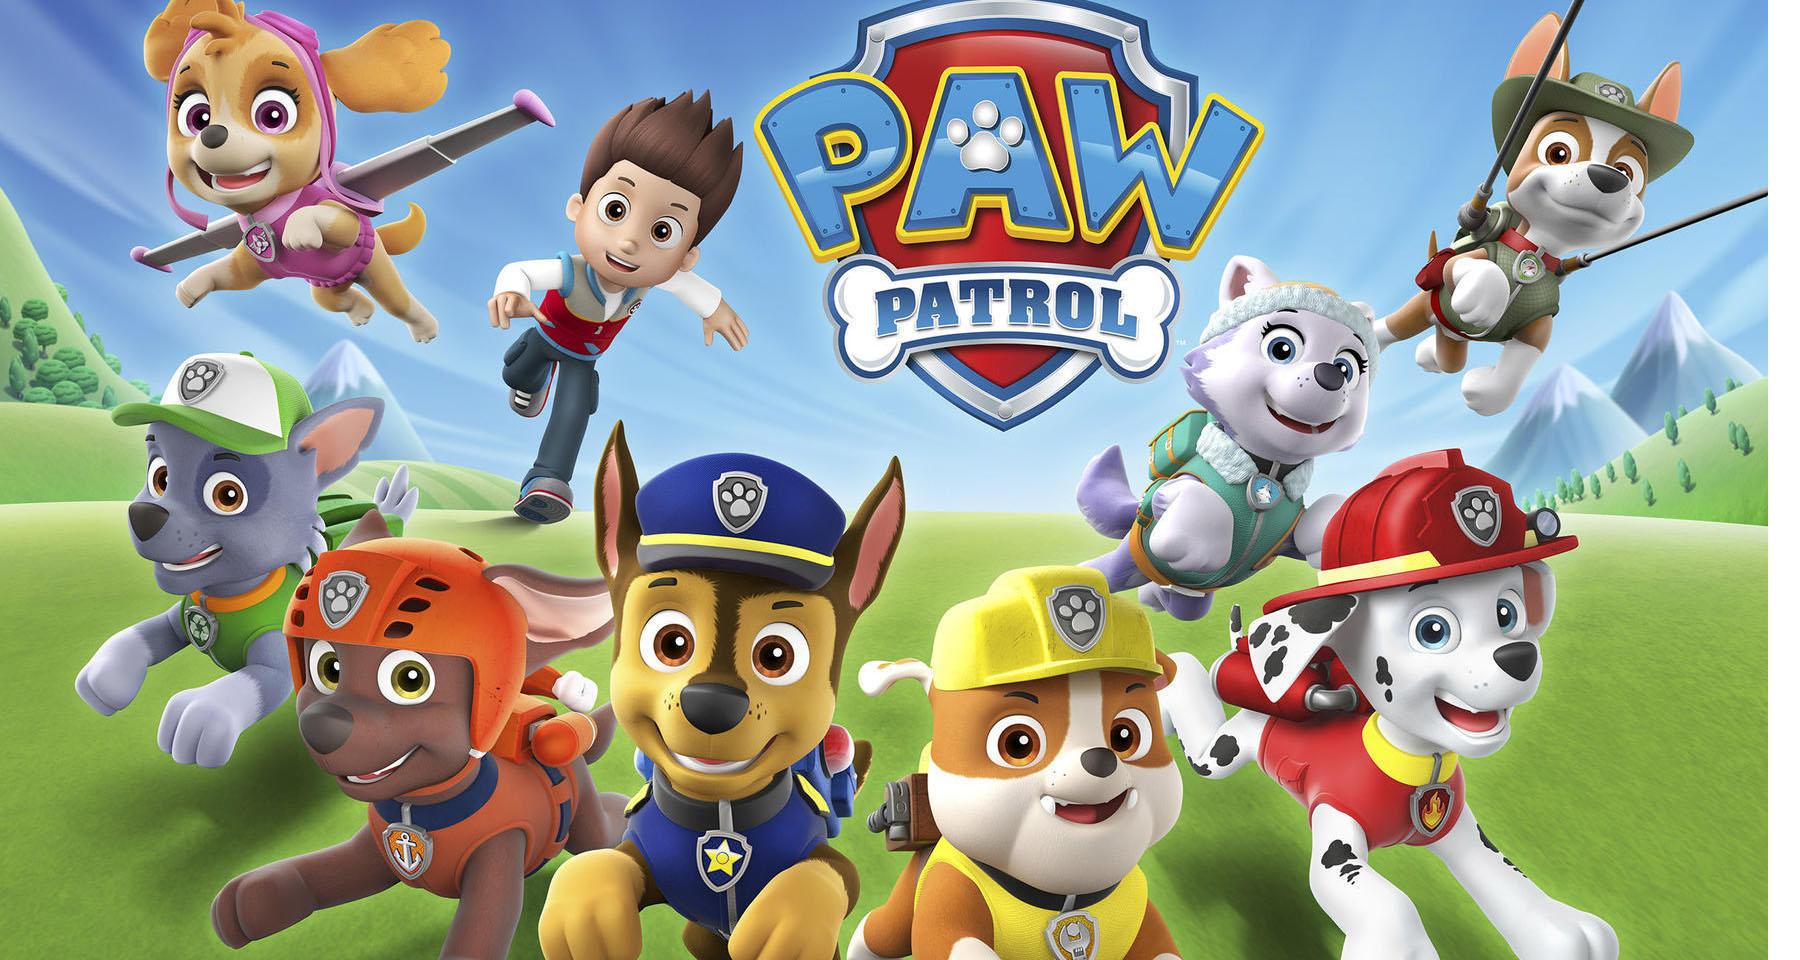 Patrolne ĹĄape (Paw Patrol)